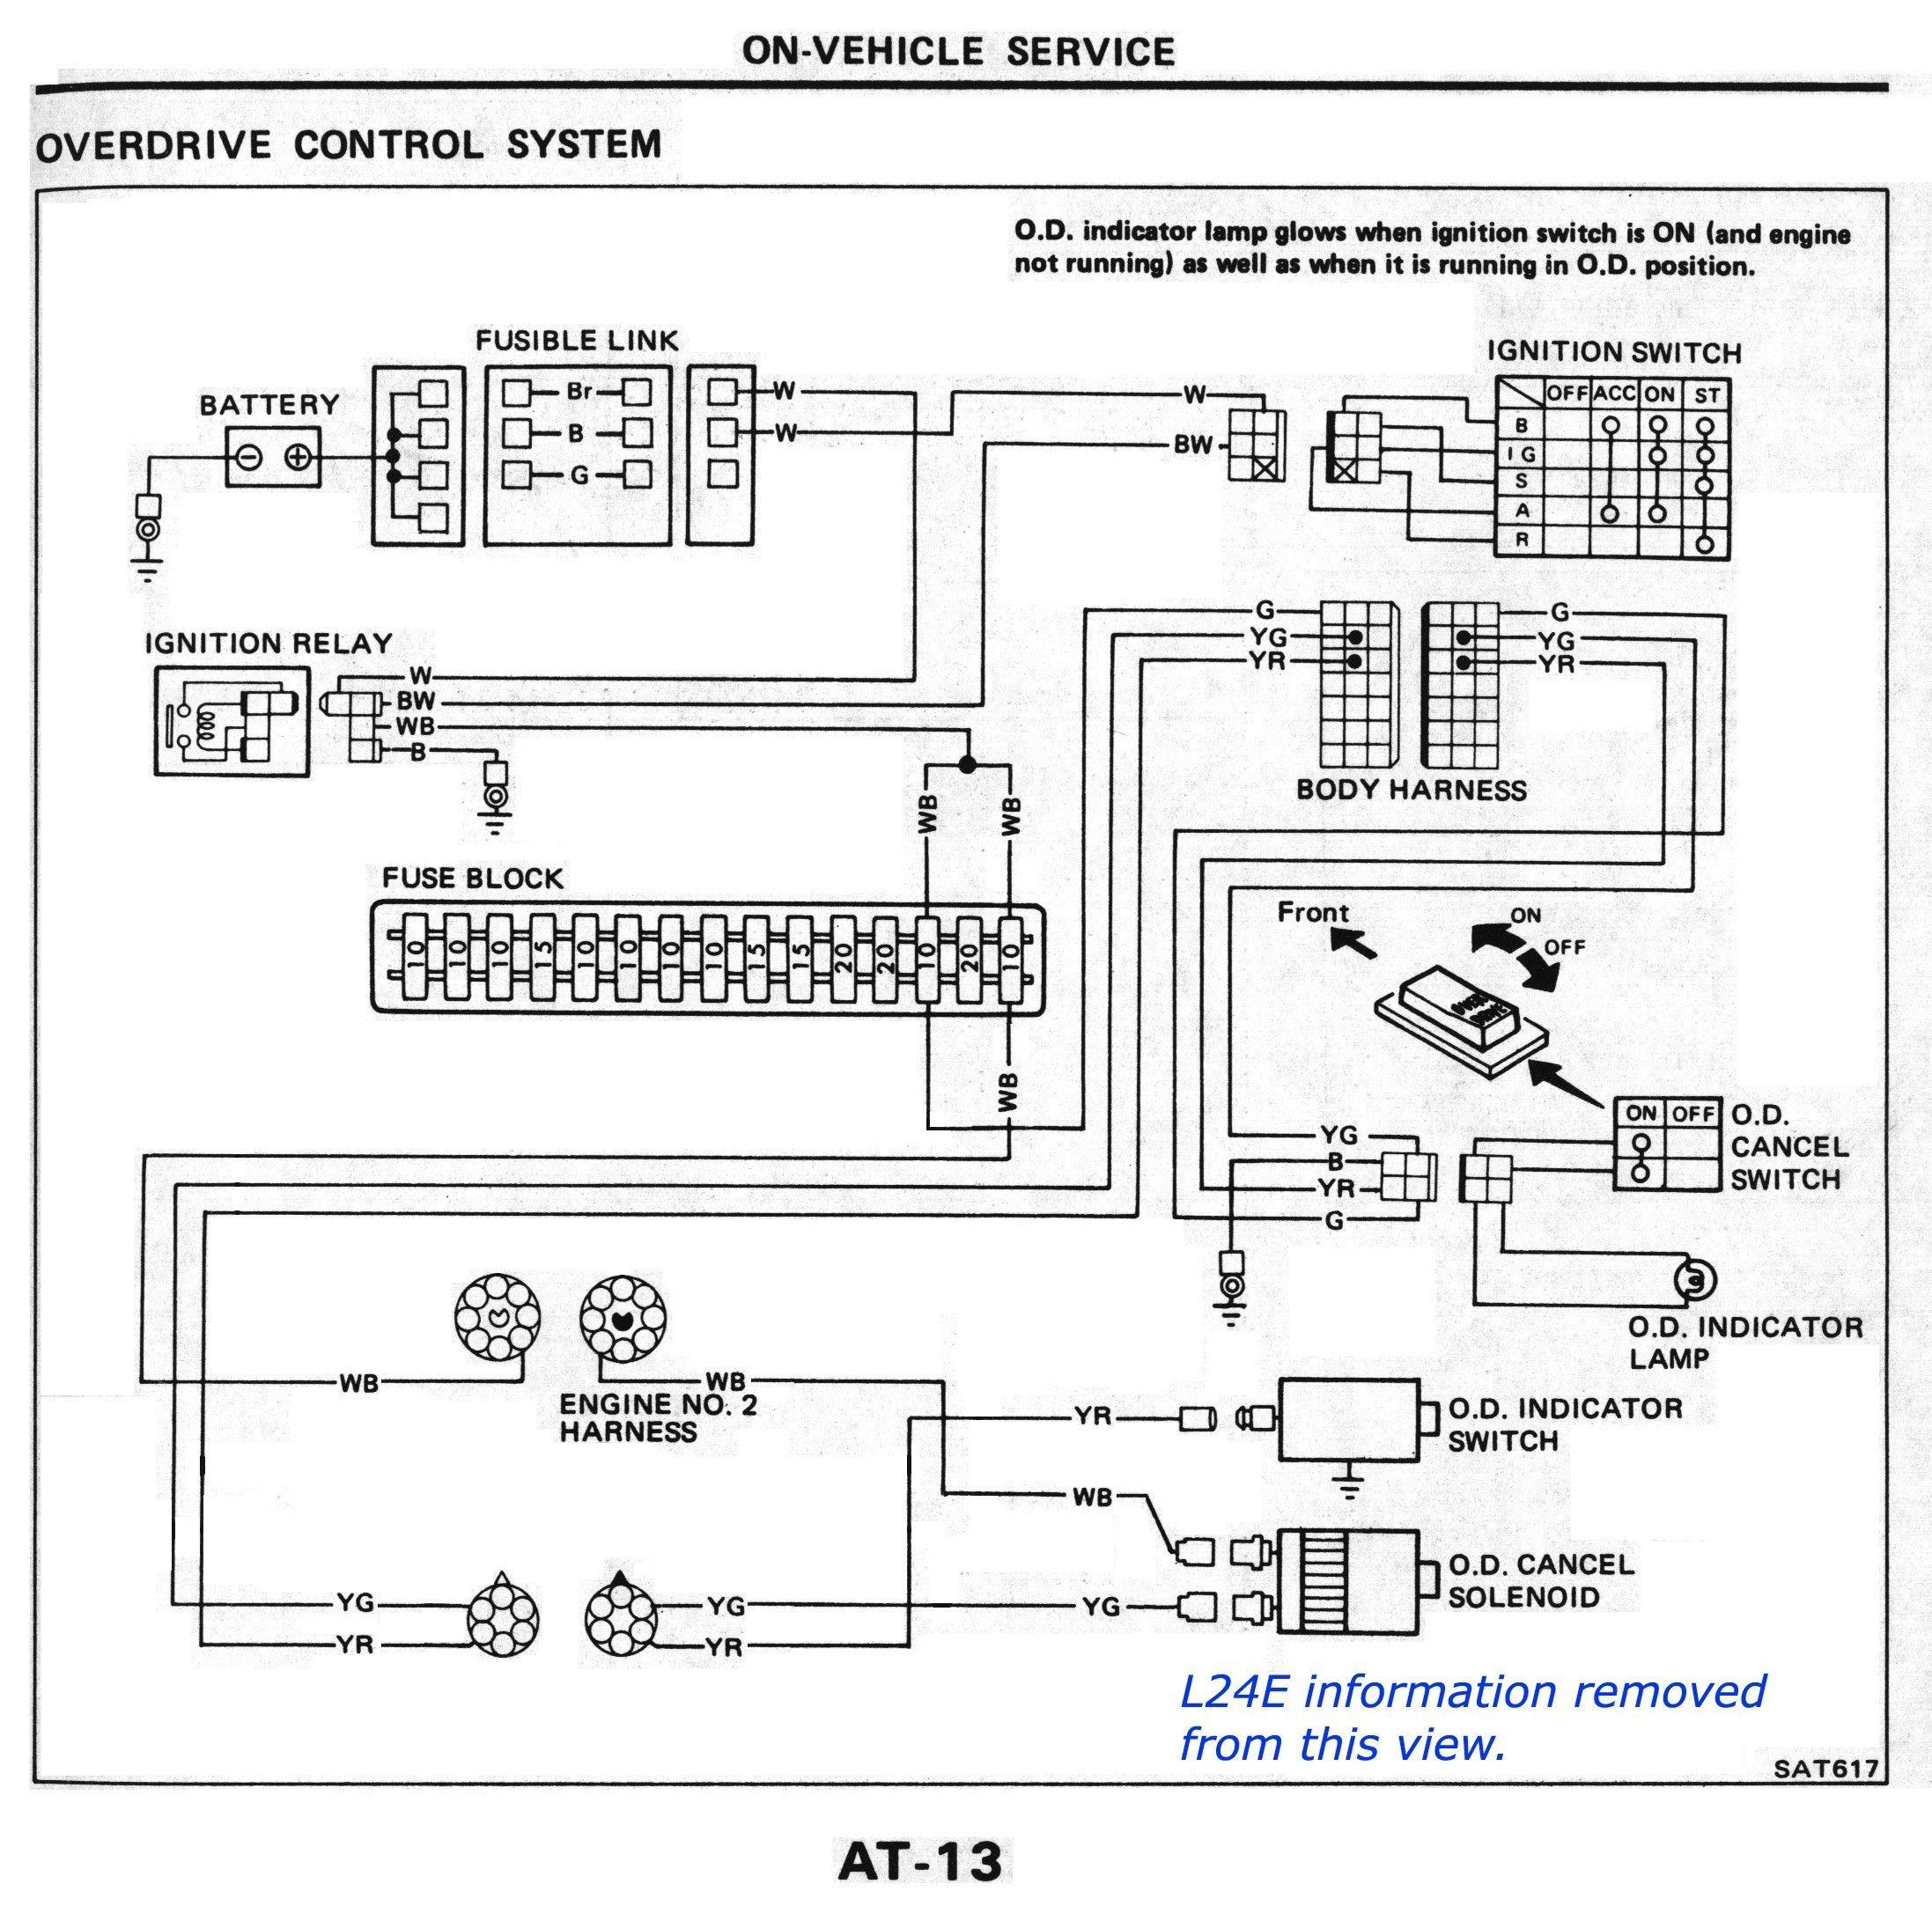 2002 Dodge Reverse Light Wiring Diagram